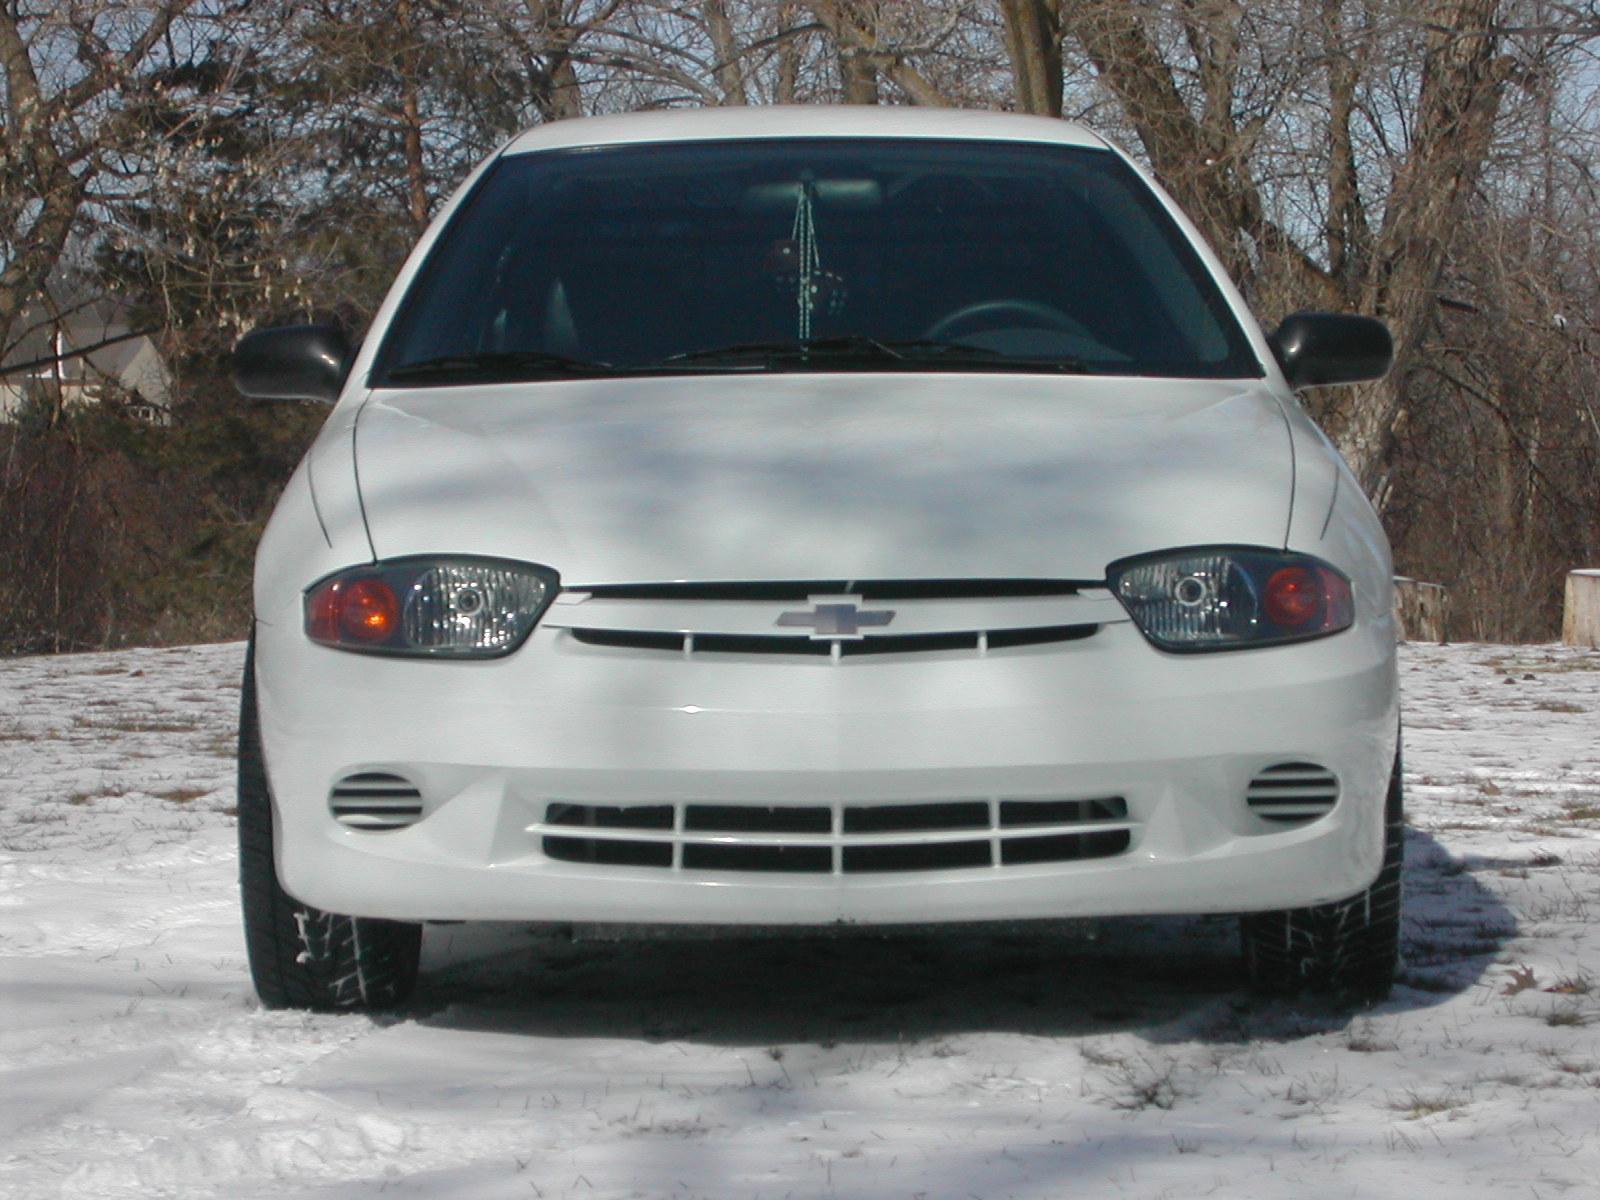 Chevrolet Cavalier 2003 foto - 2